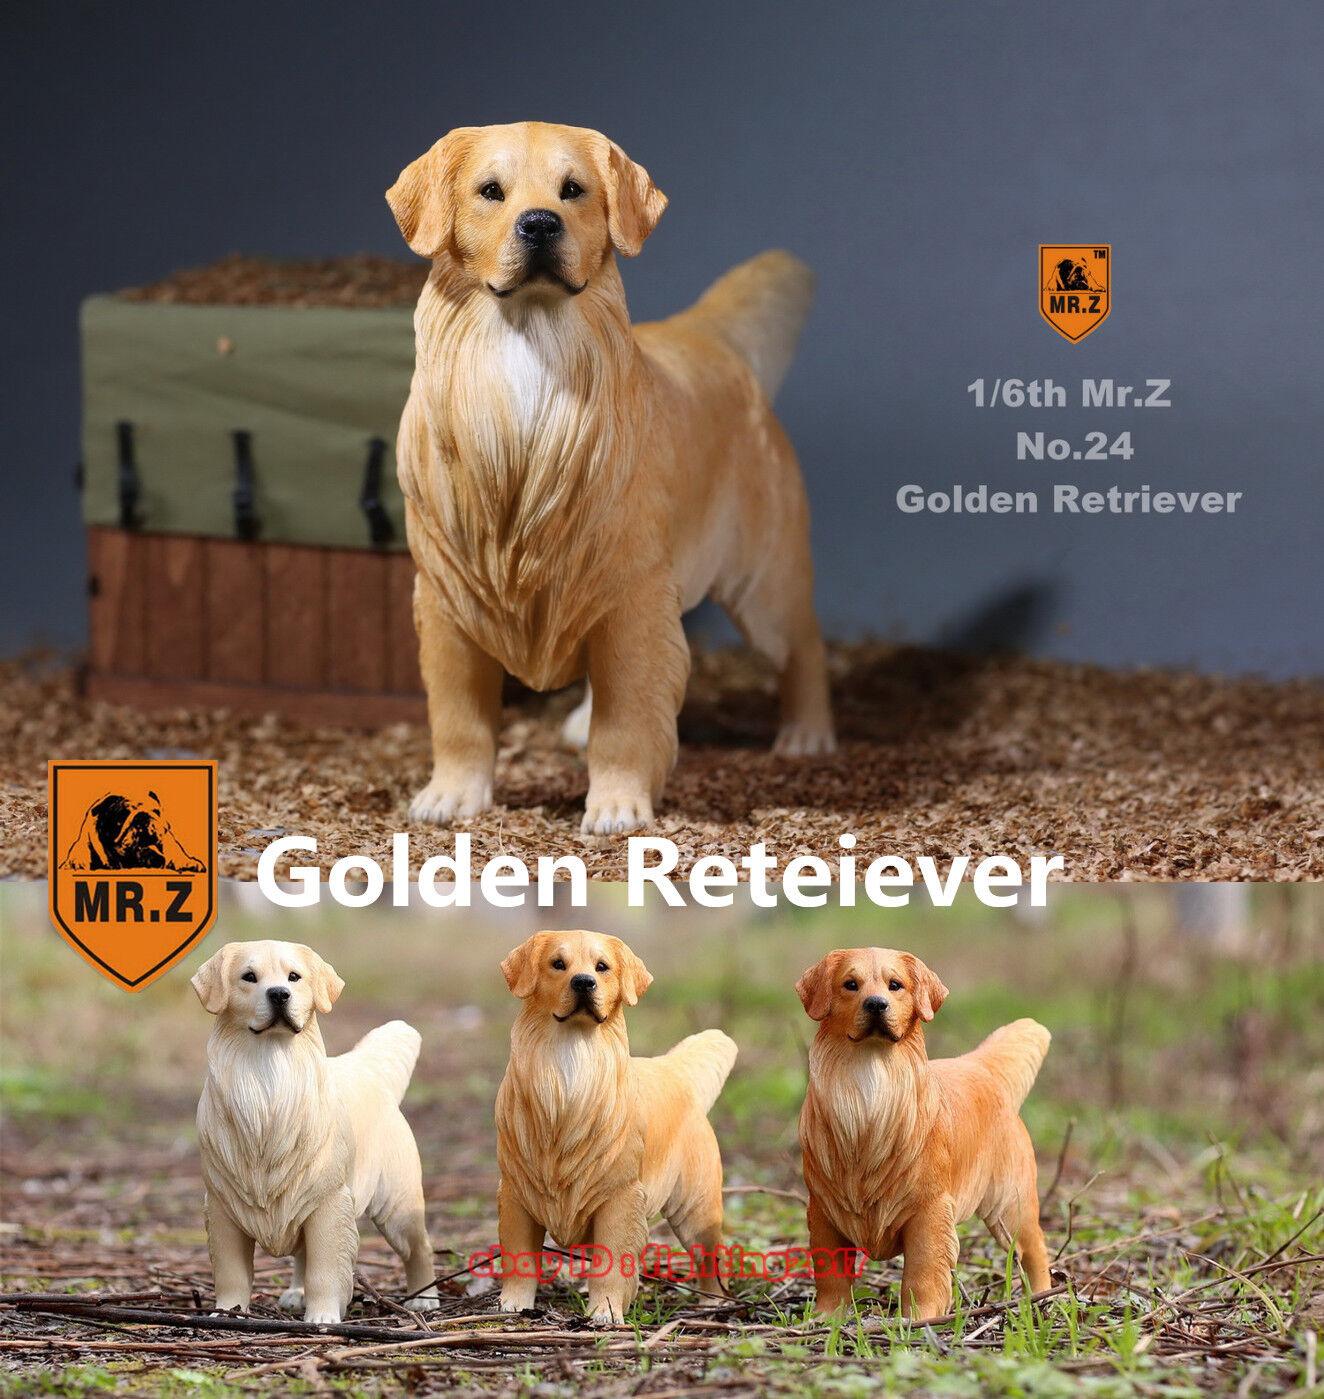 Mr.Z Animal Model 1 6 MRZ NO.24 golden Retriever Dog Figure 001-003